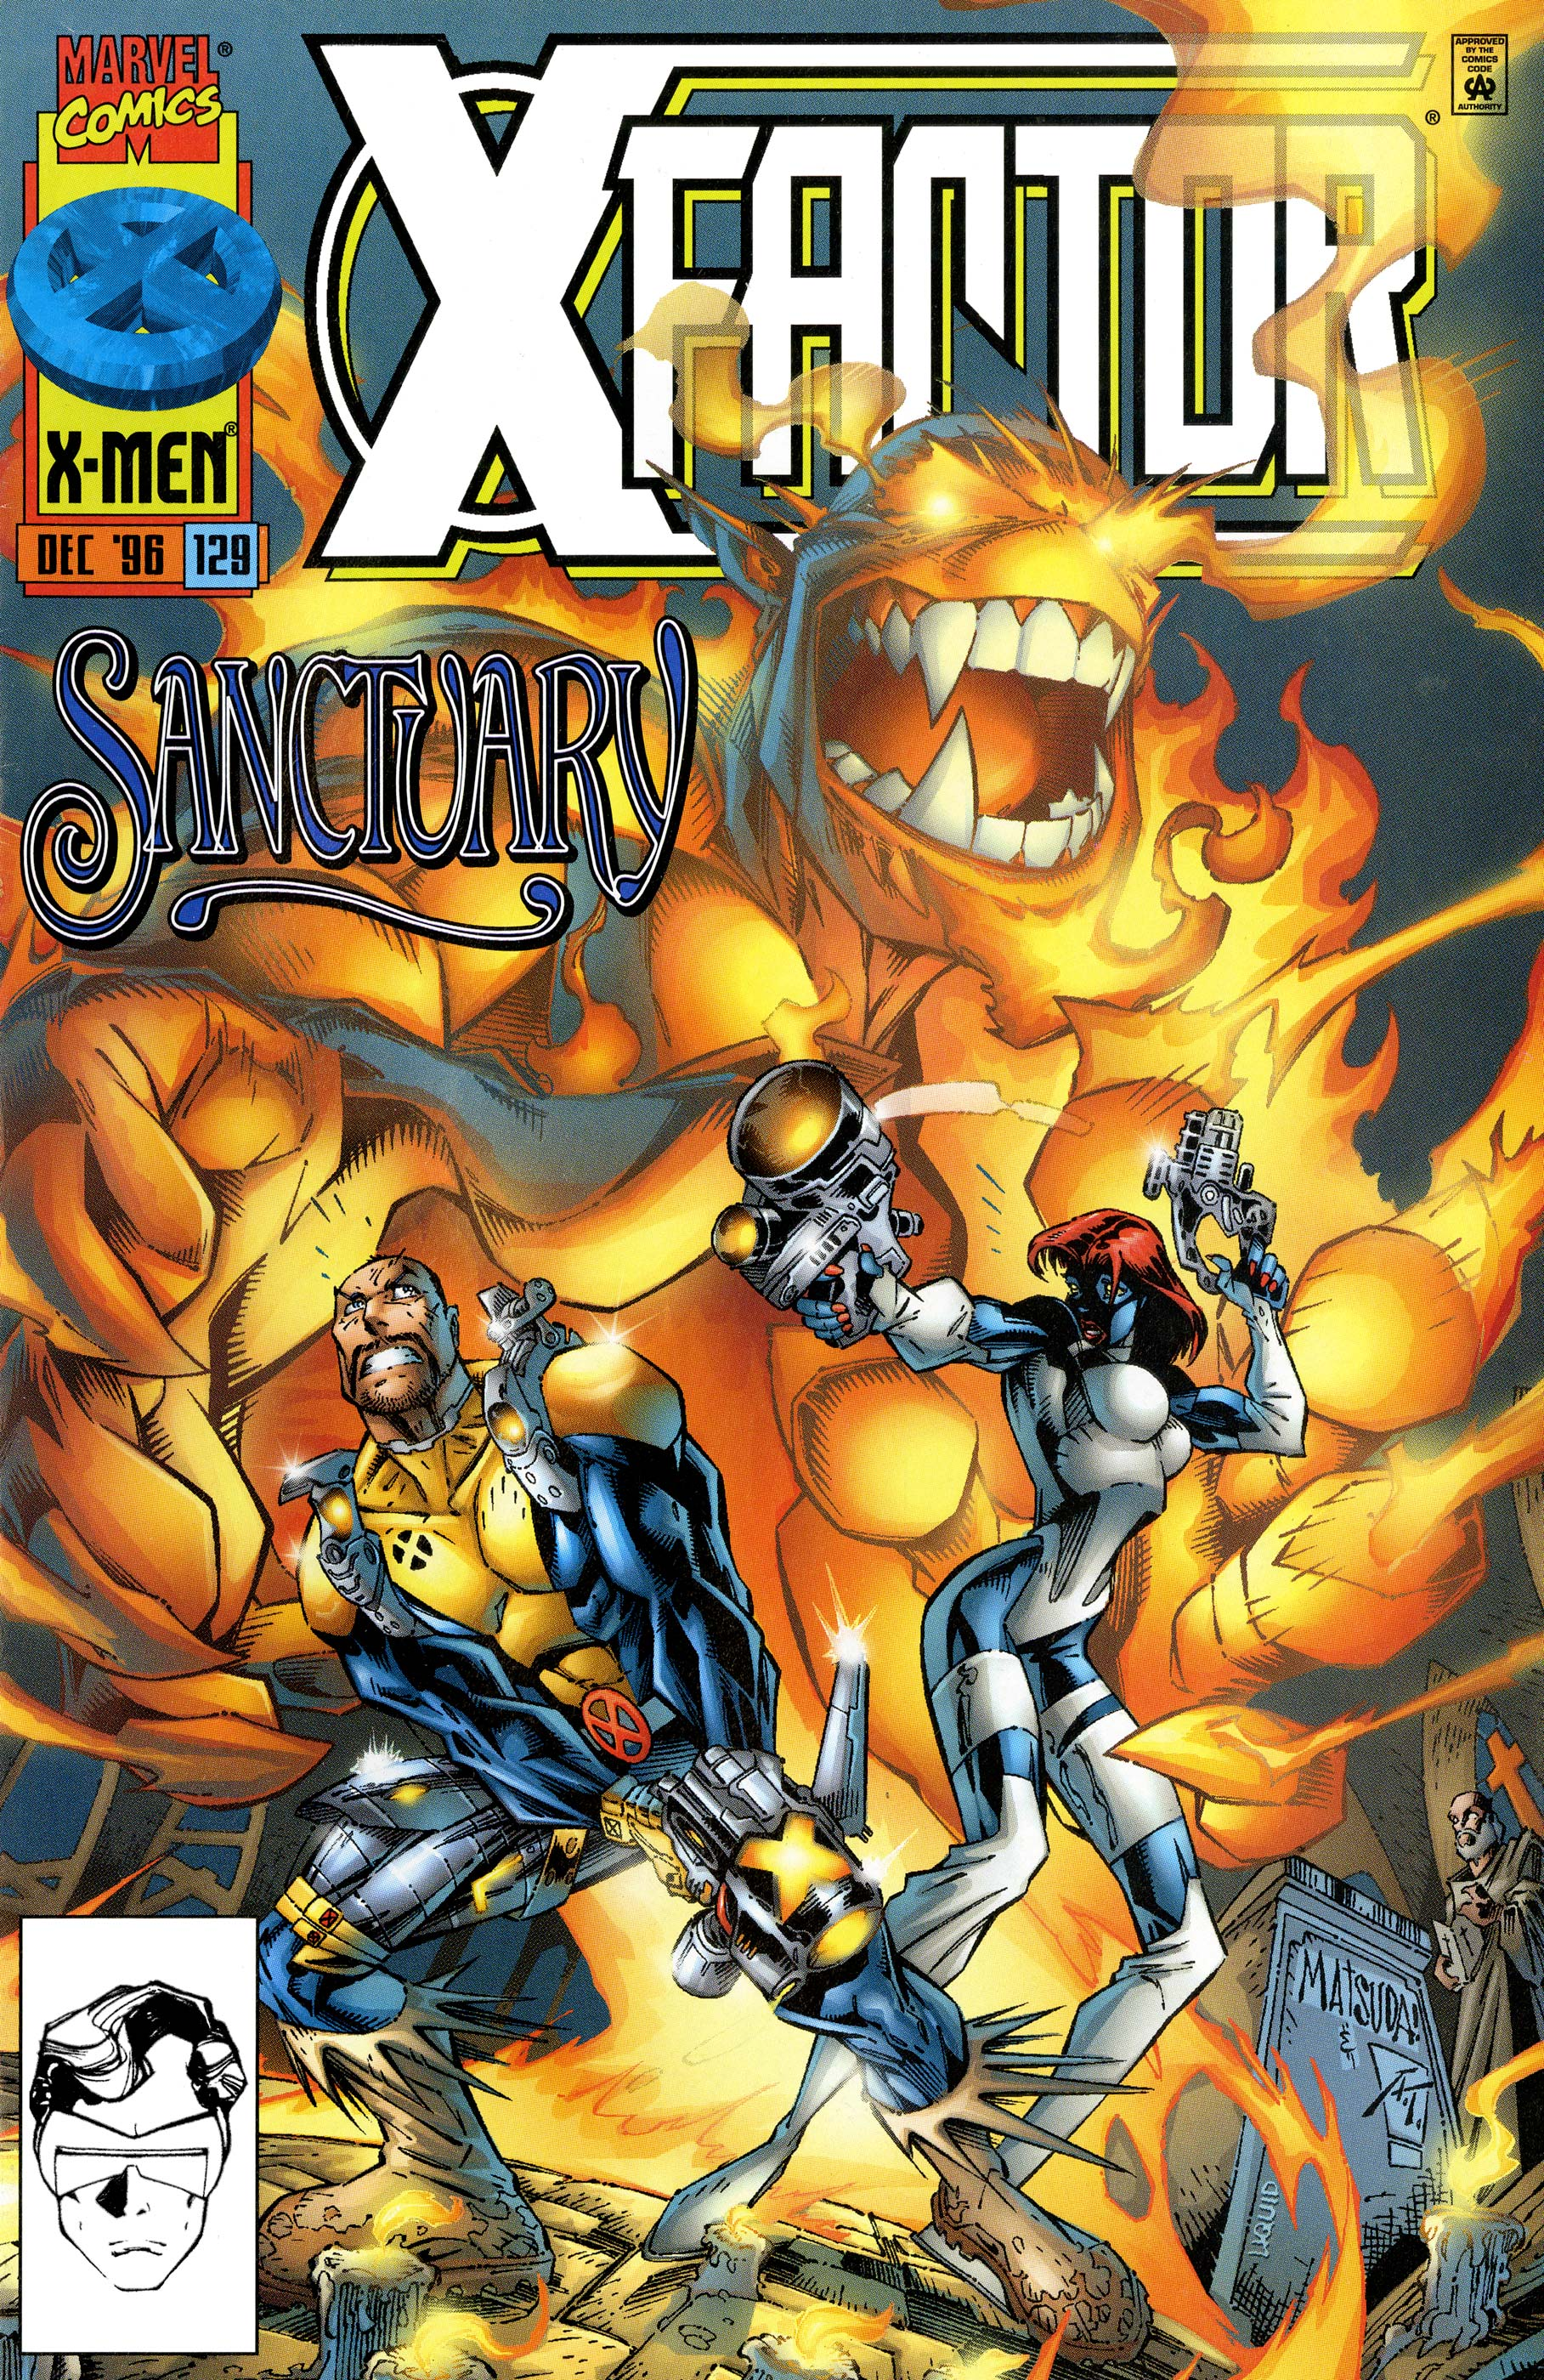 X-Factor (1986) #129